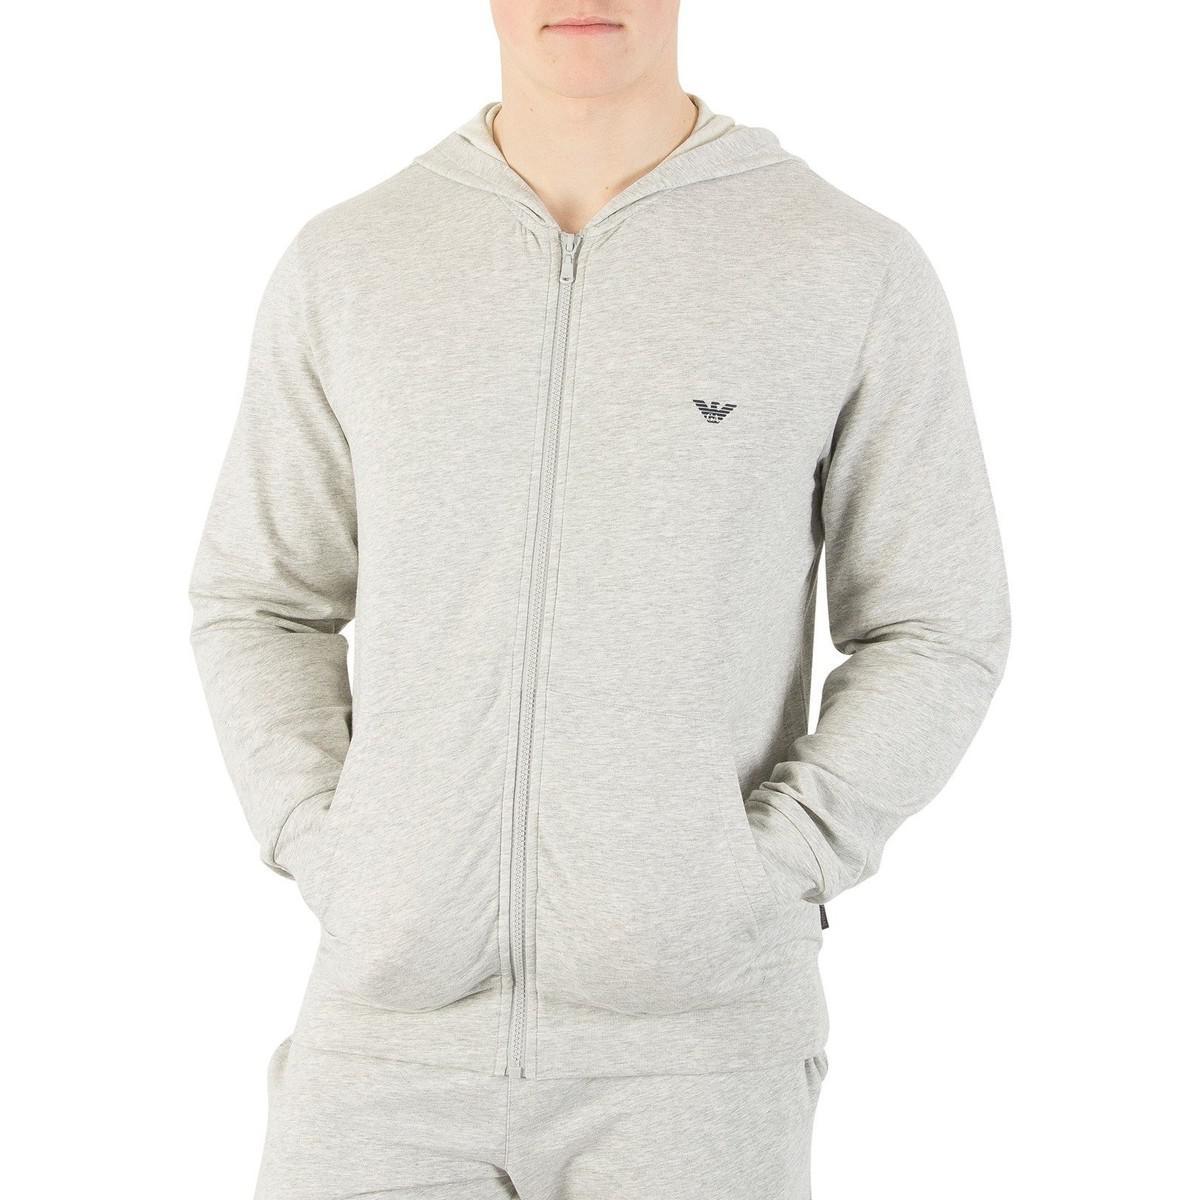 Lyst - Homme Zip Loungewear Haut, Gris hommes Sweat-shirt en Gris ... 5b7506b3f71b